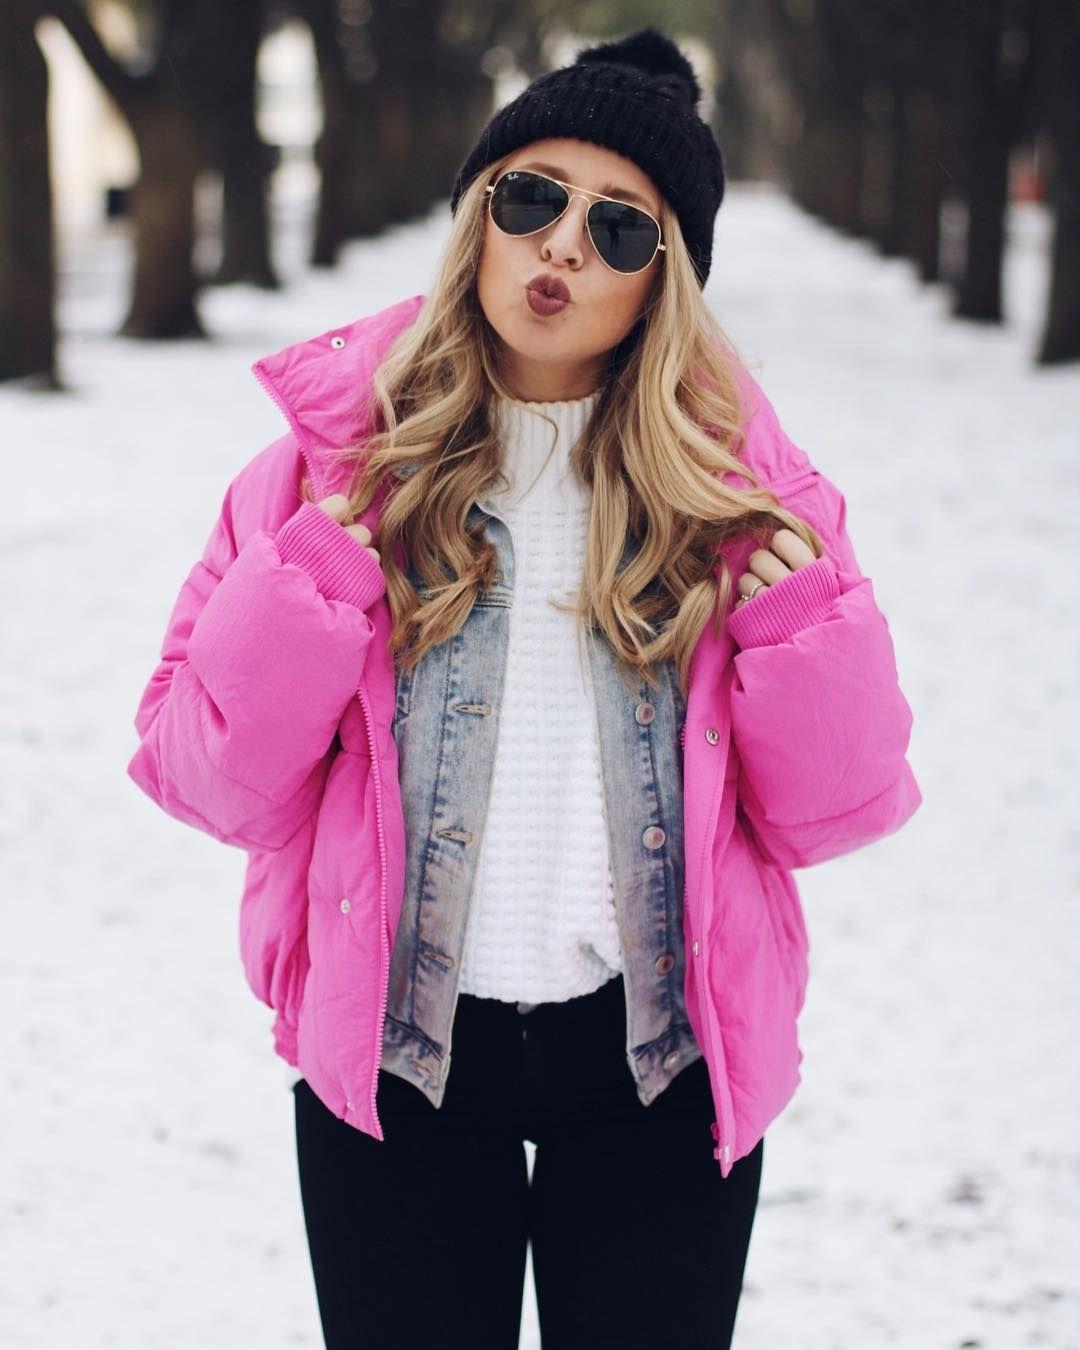 Pink Puffer Coat Outfit Pinkpuffercoat Winterfashion Winterstyle Snowdayoutfit Winter Jacket Outfits Pink Puffer Coat Puffer Jacket Outfit [ 1350 x 1080 Pixel ]